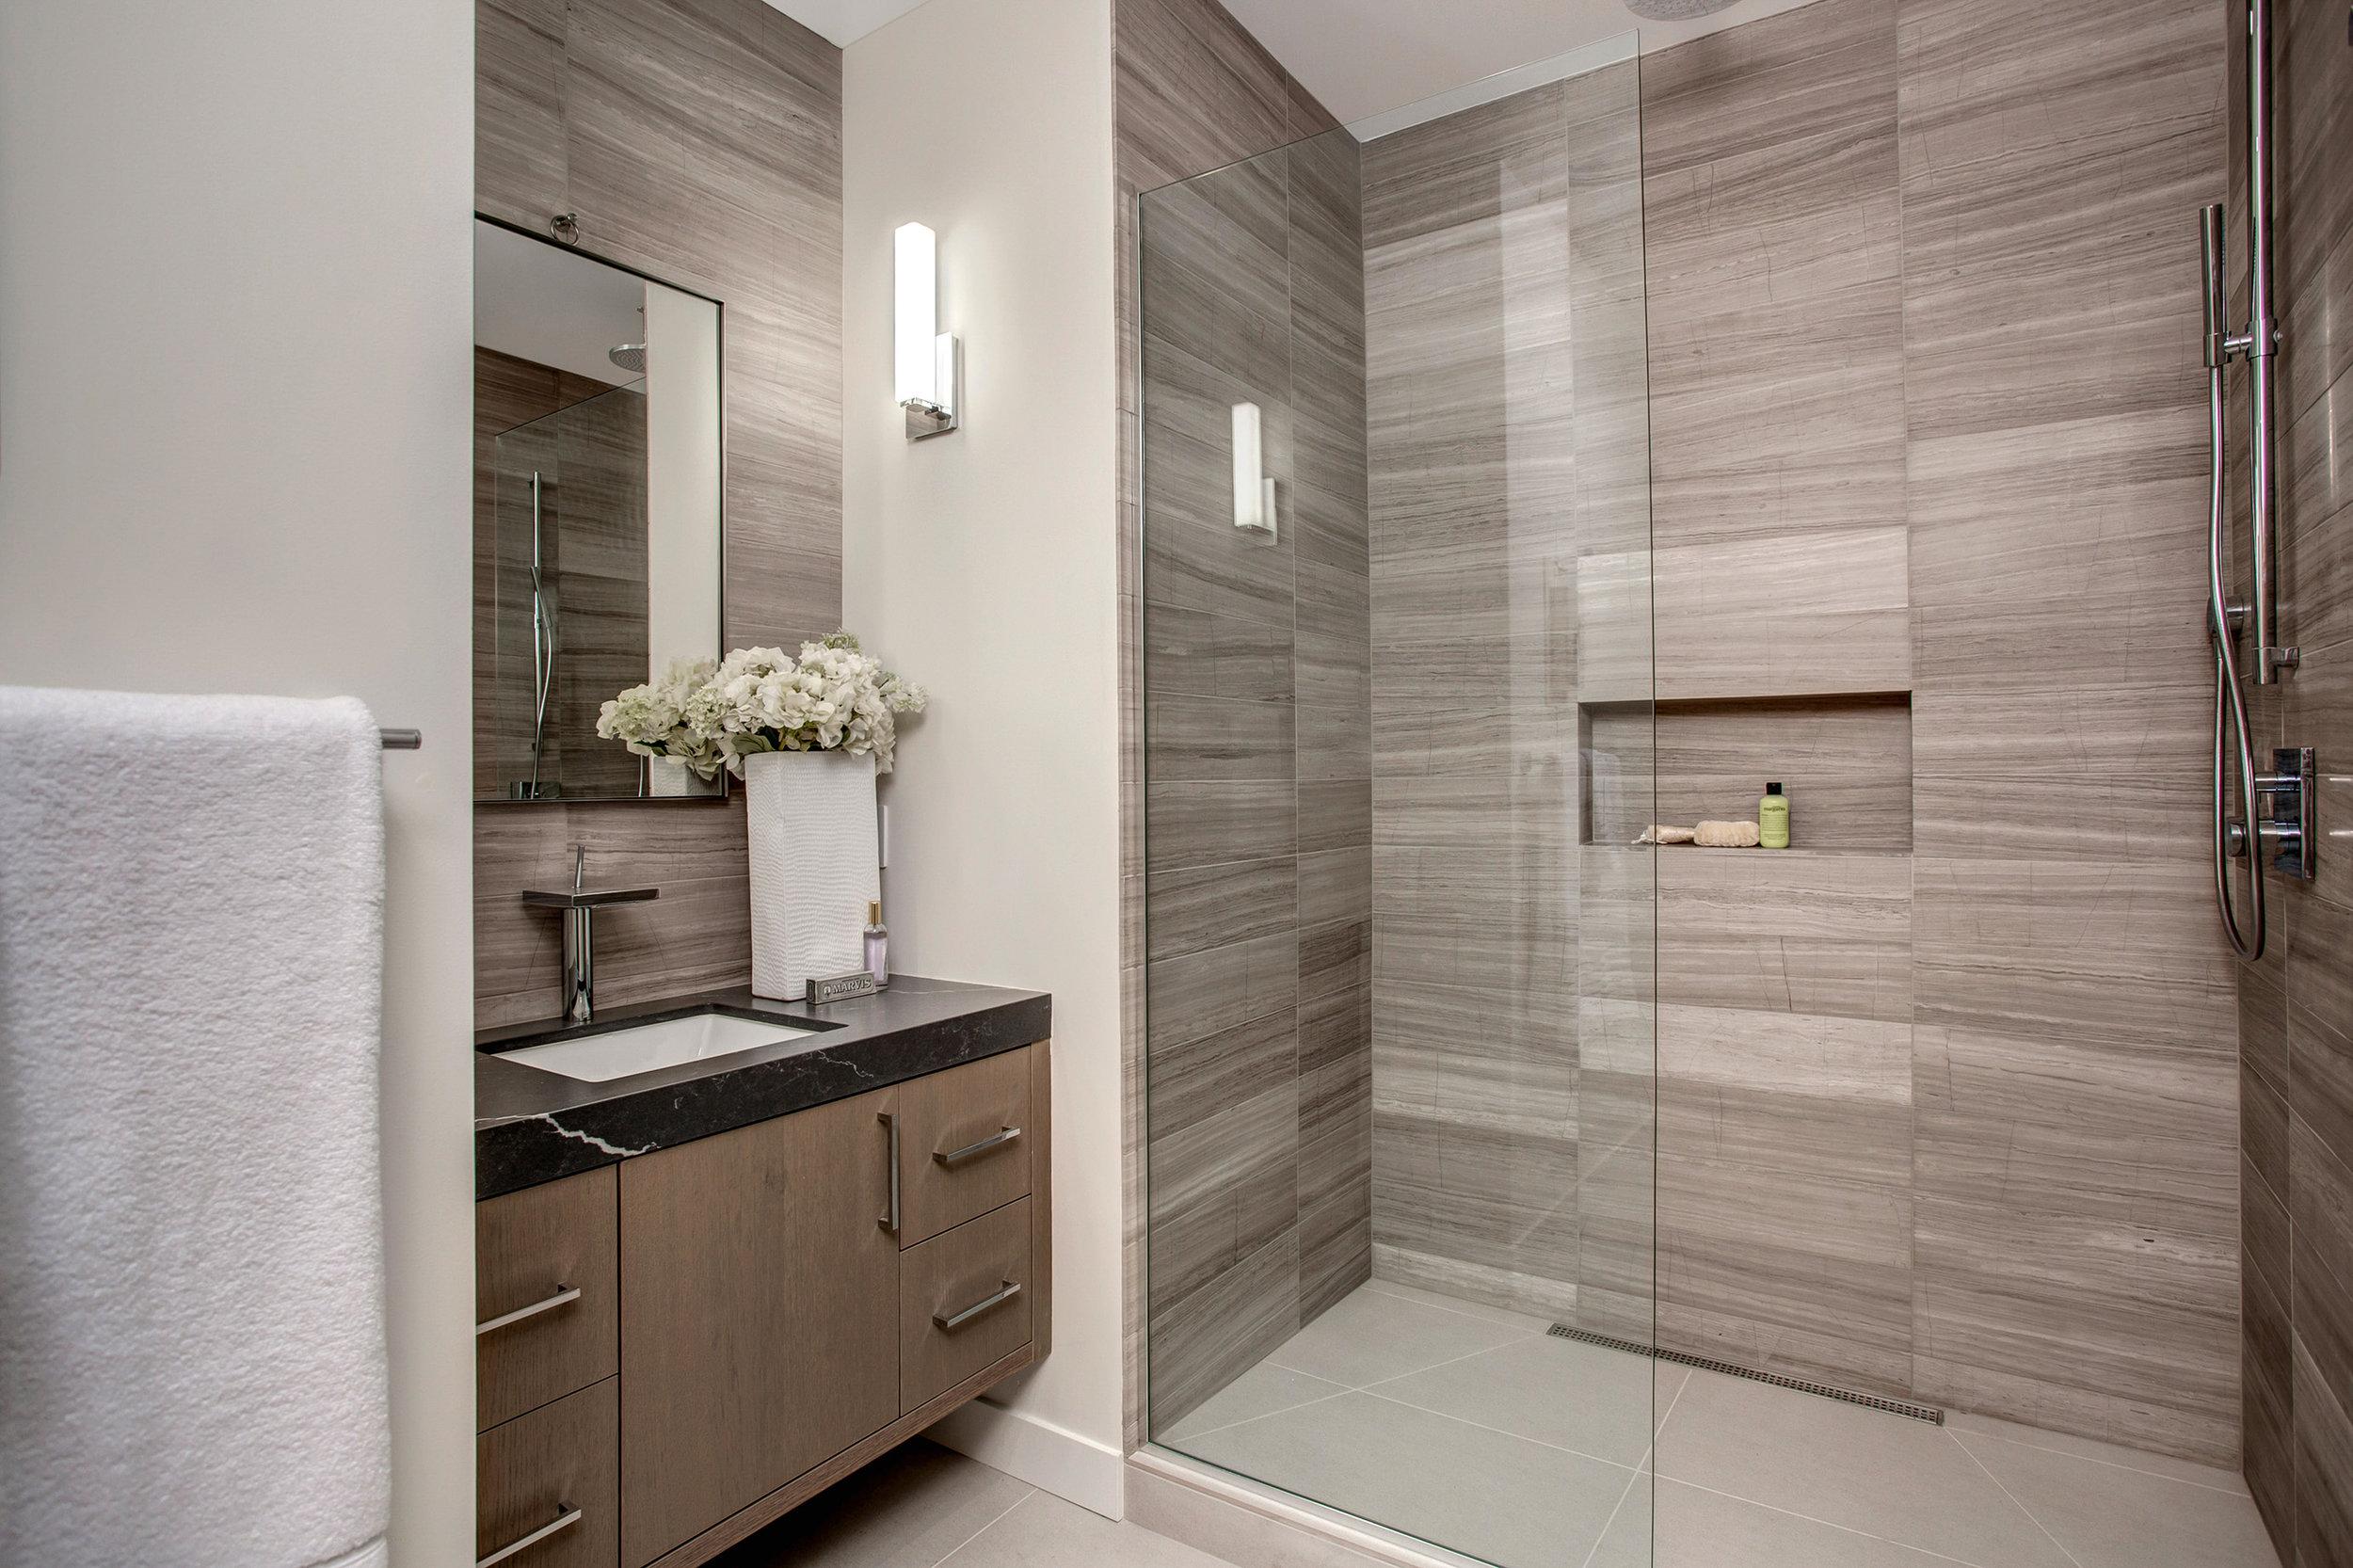 En suite guest bathroom with floor to ceiling Marble tile shower and vanity wall.